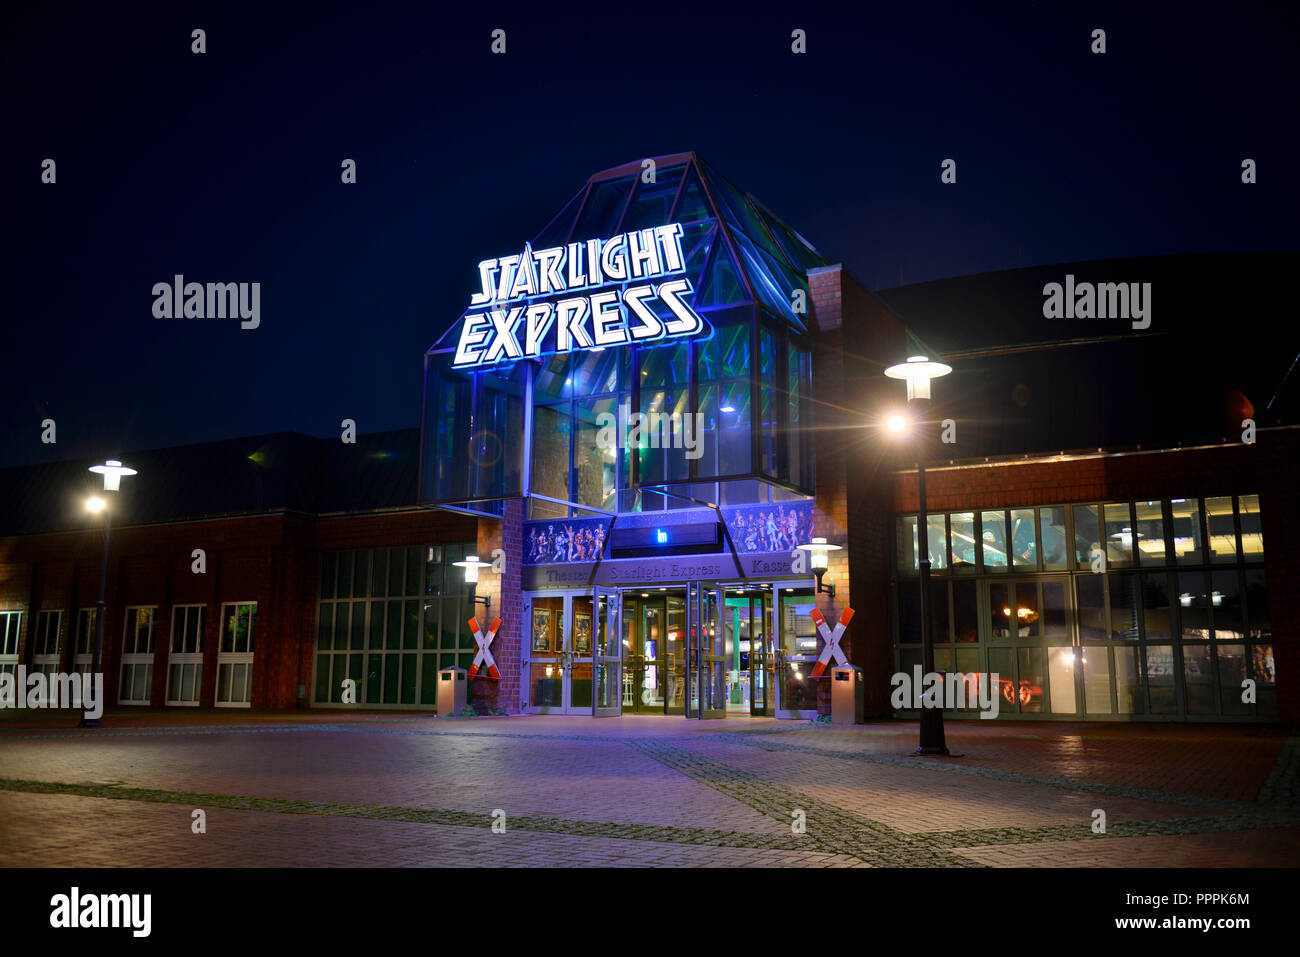 Starlight Express Theater Stock Photos Starlight Express Theater